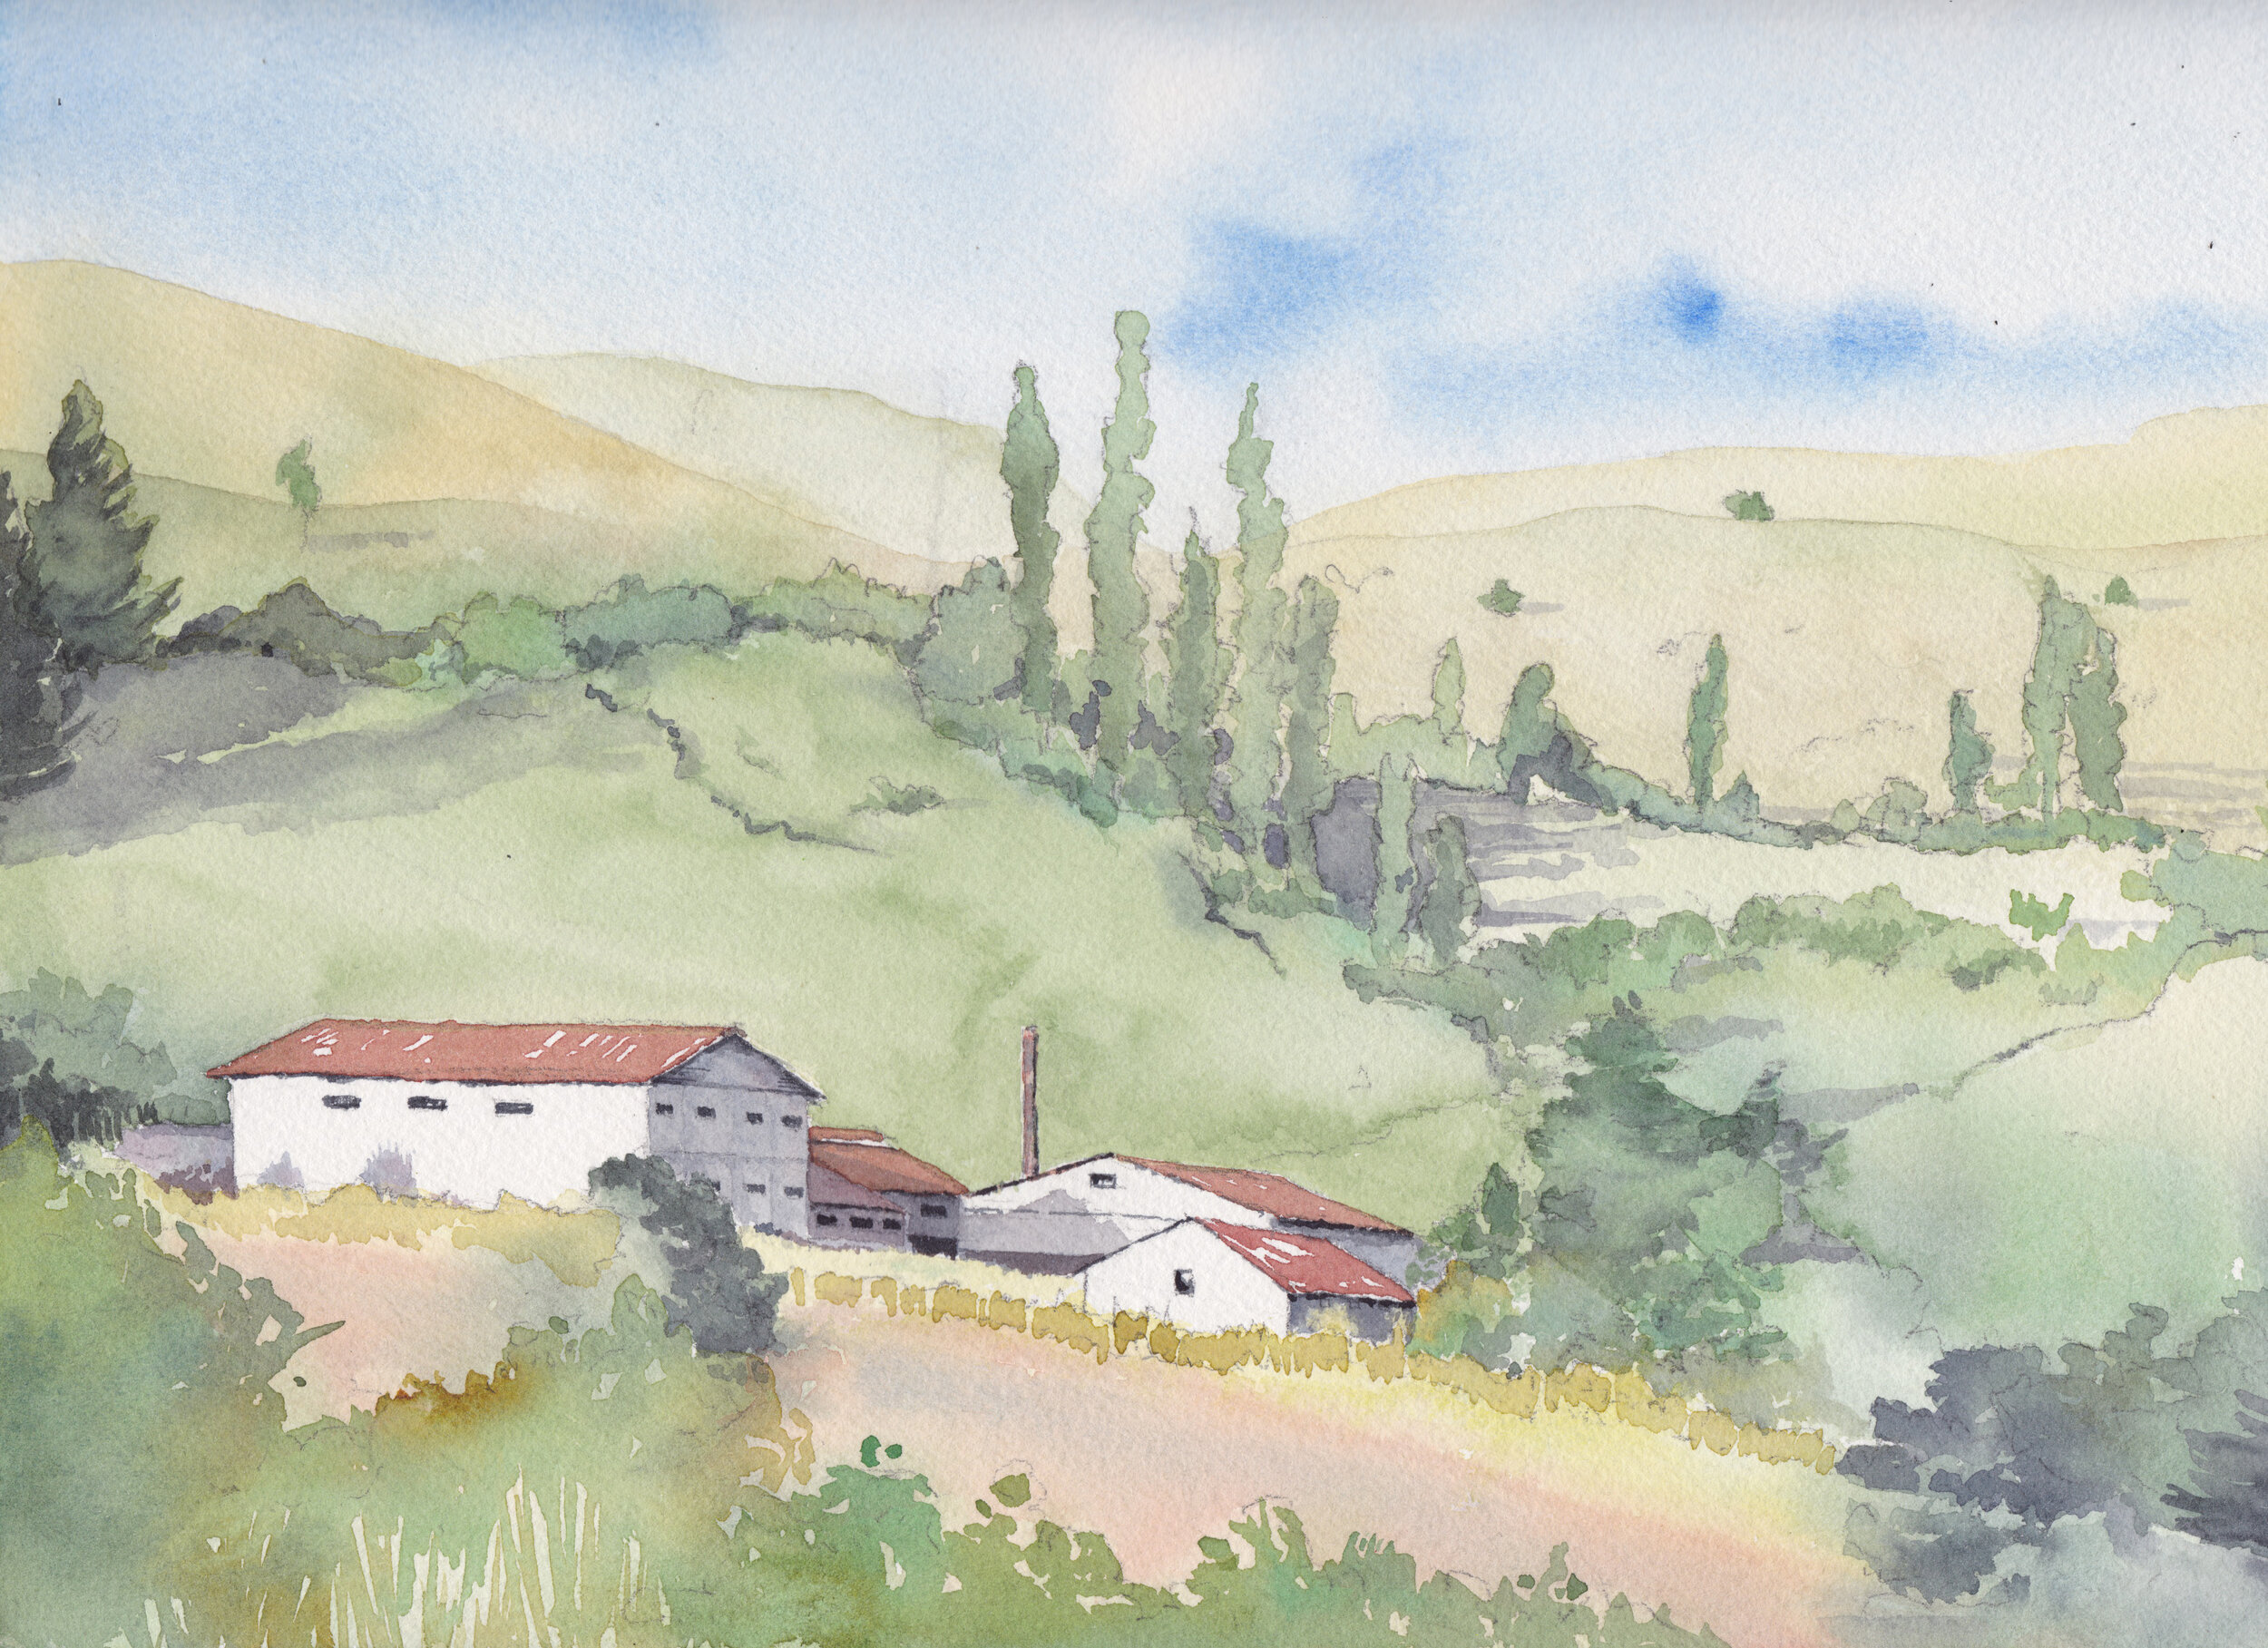 """Lechería San Pedro"",  IX Región, Chile Tamaño Lámina: 23 x 31 cms. Valor: $180.000  DISPONIBLE"